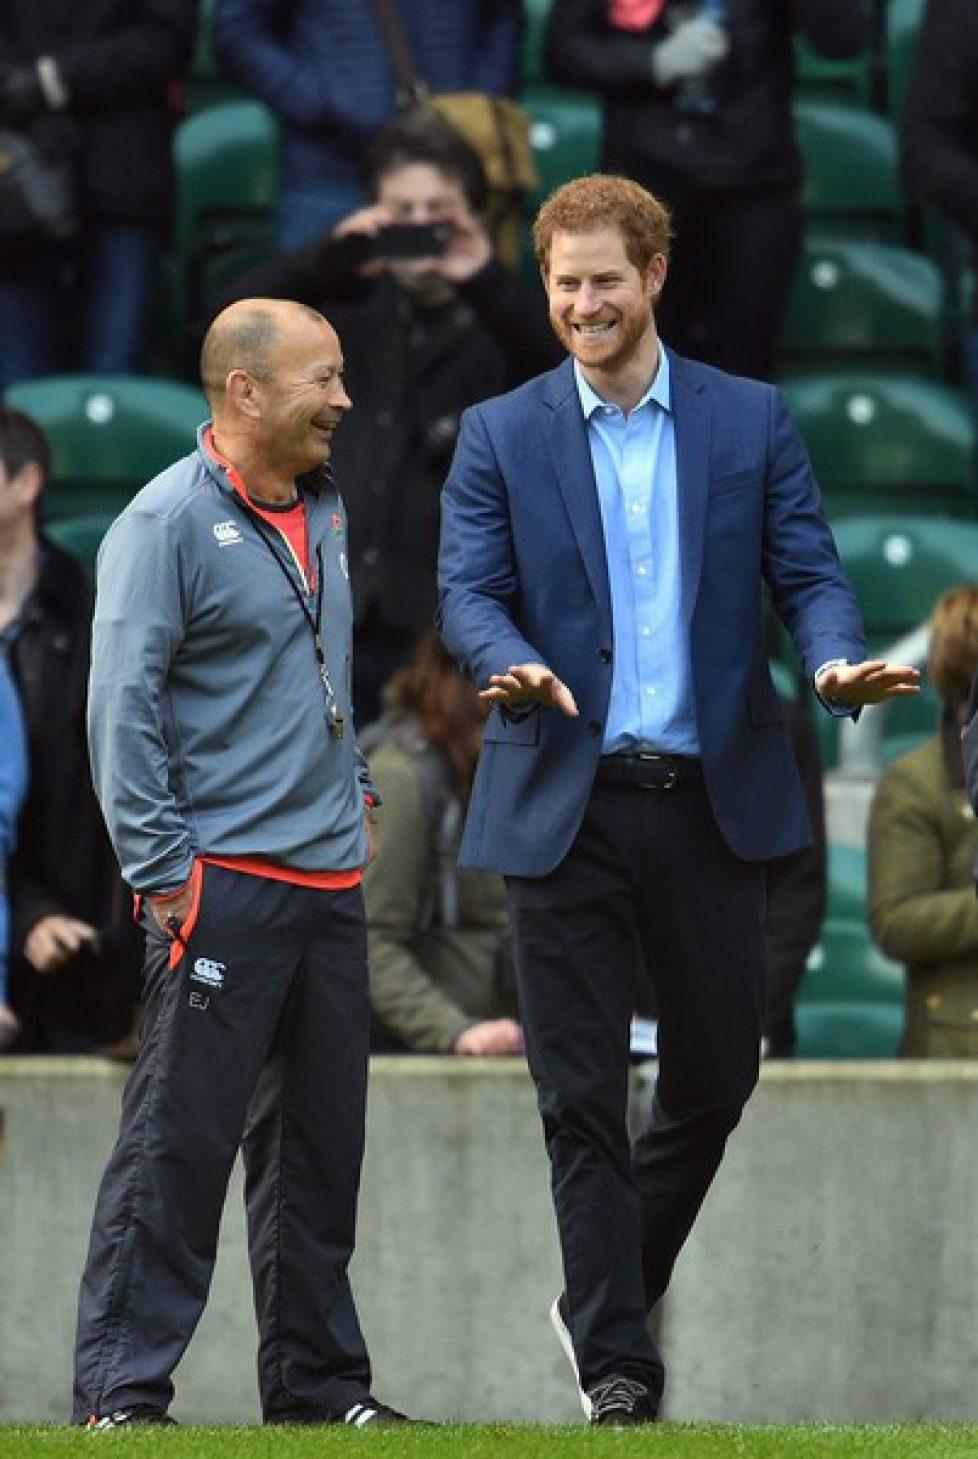 Le prince Harry encourage l'équipe anglaise de rugby